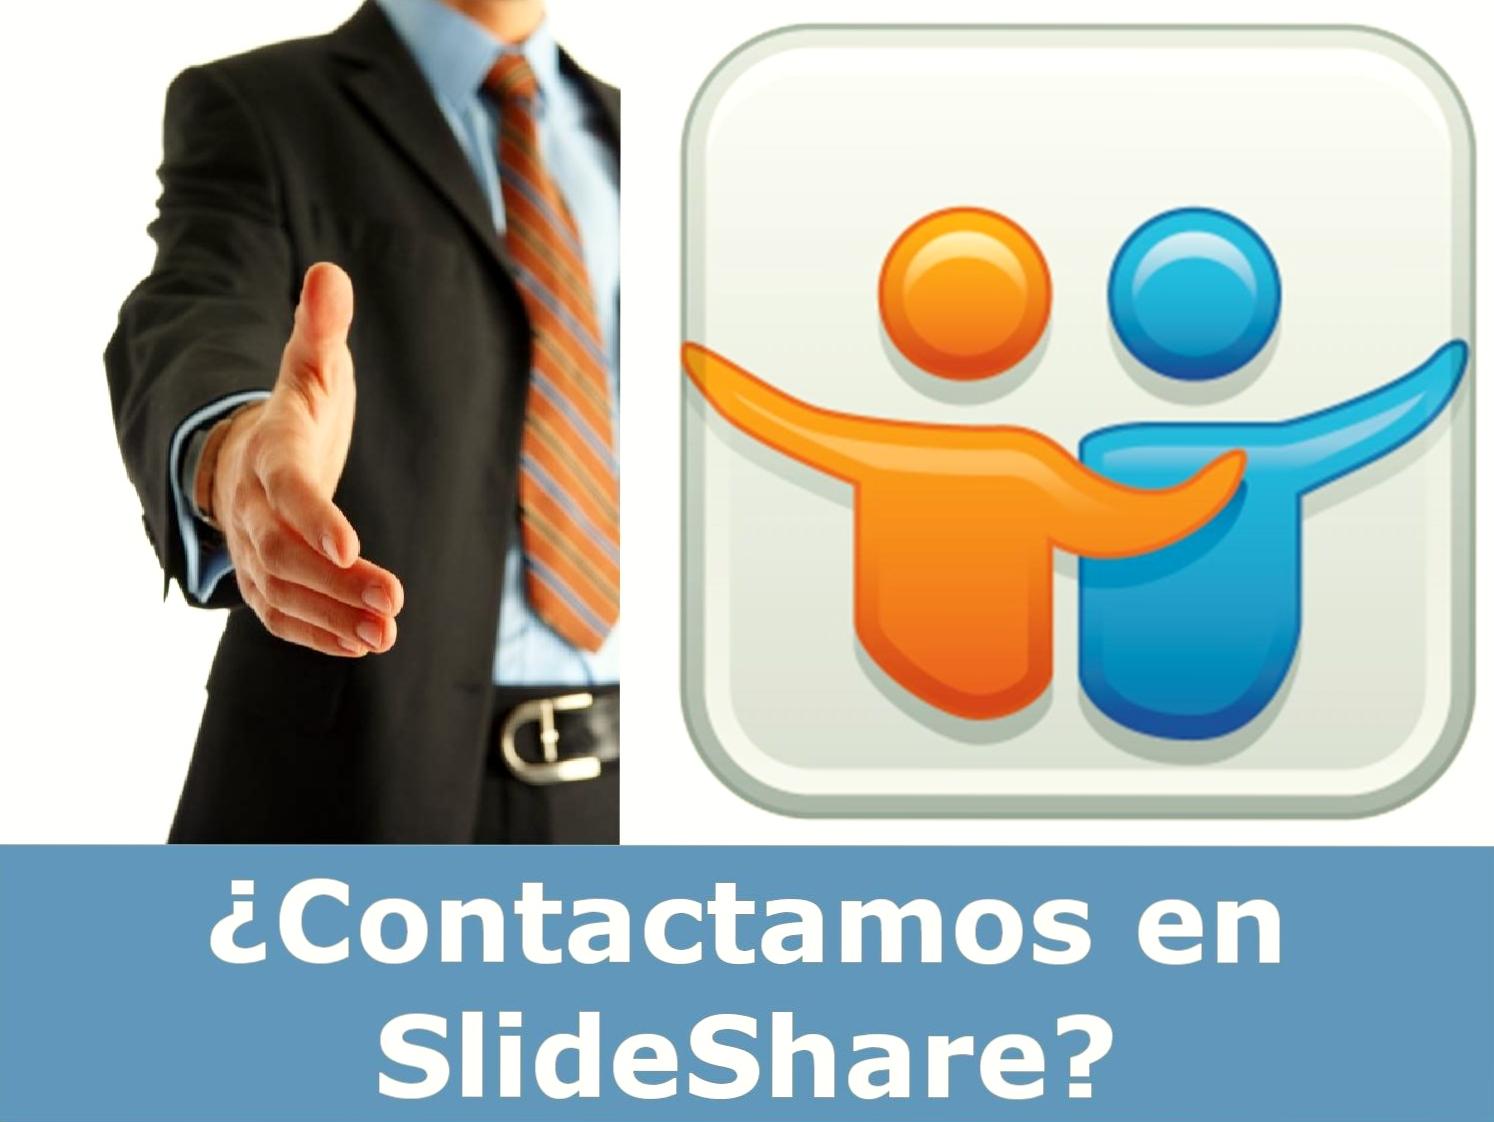 ¿Contactamos en SlideShare?